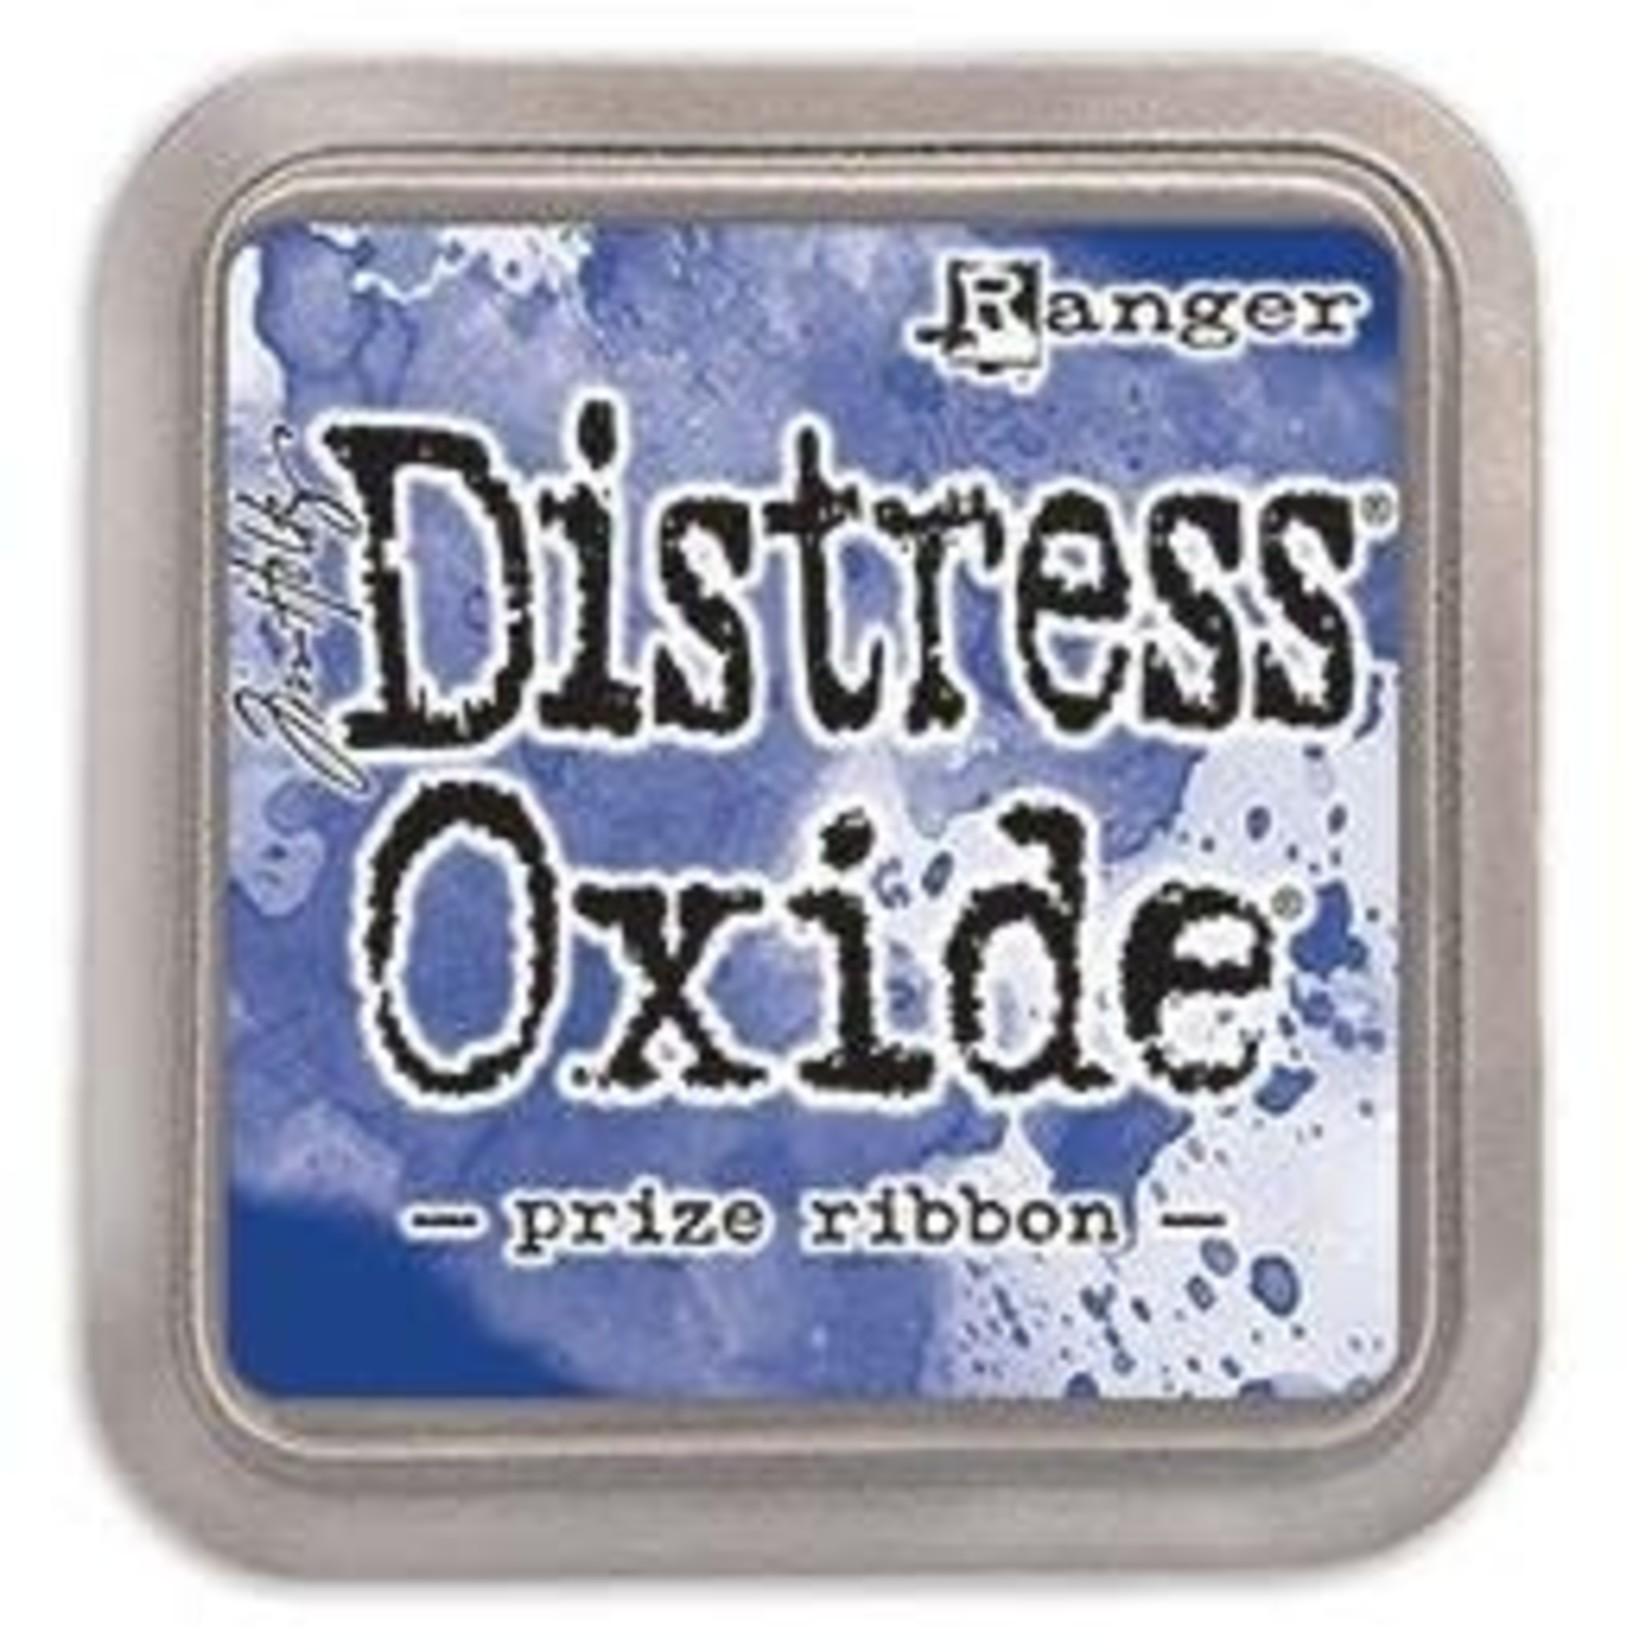 Tim Holtz Tim Holtz Distress Oxides Ink Pad - Prize Ribbon